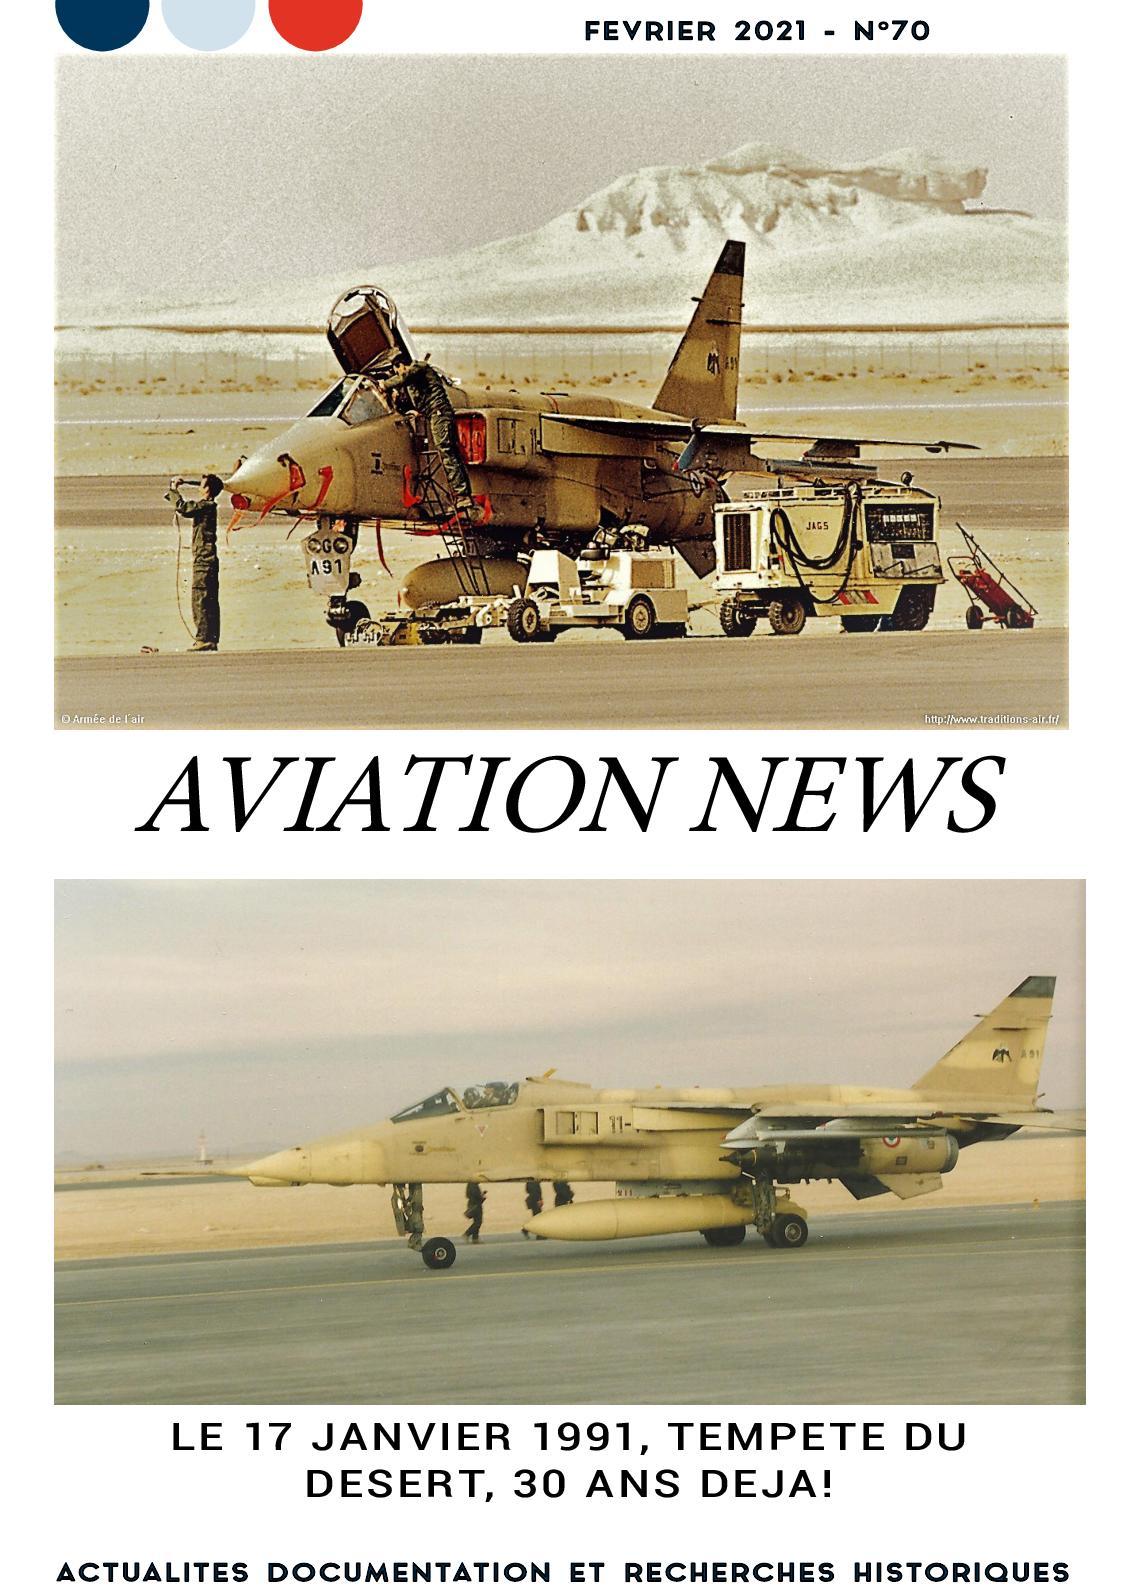 AVIATION NEWS N° 70  FEVRIER 2021